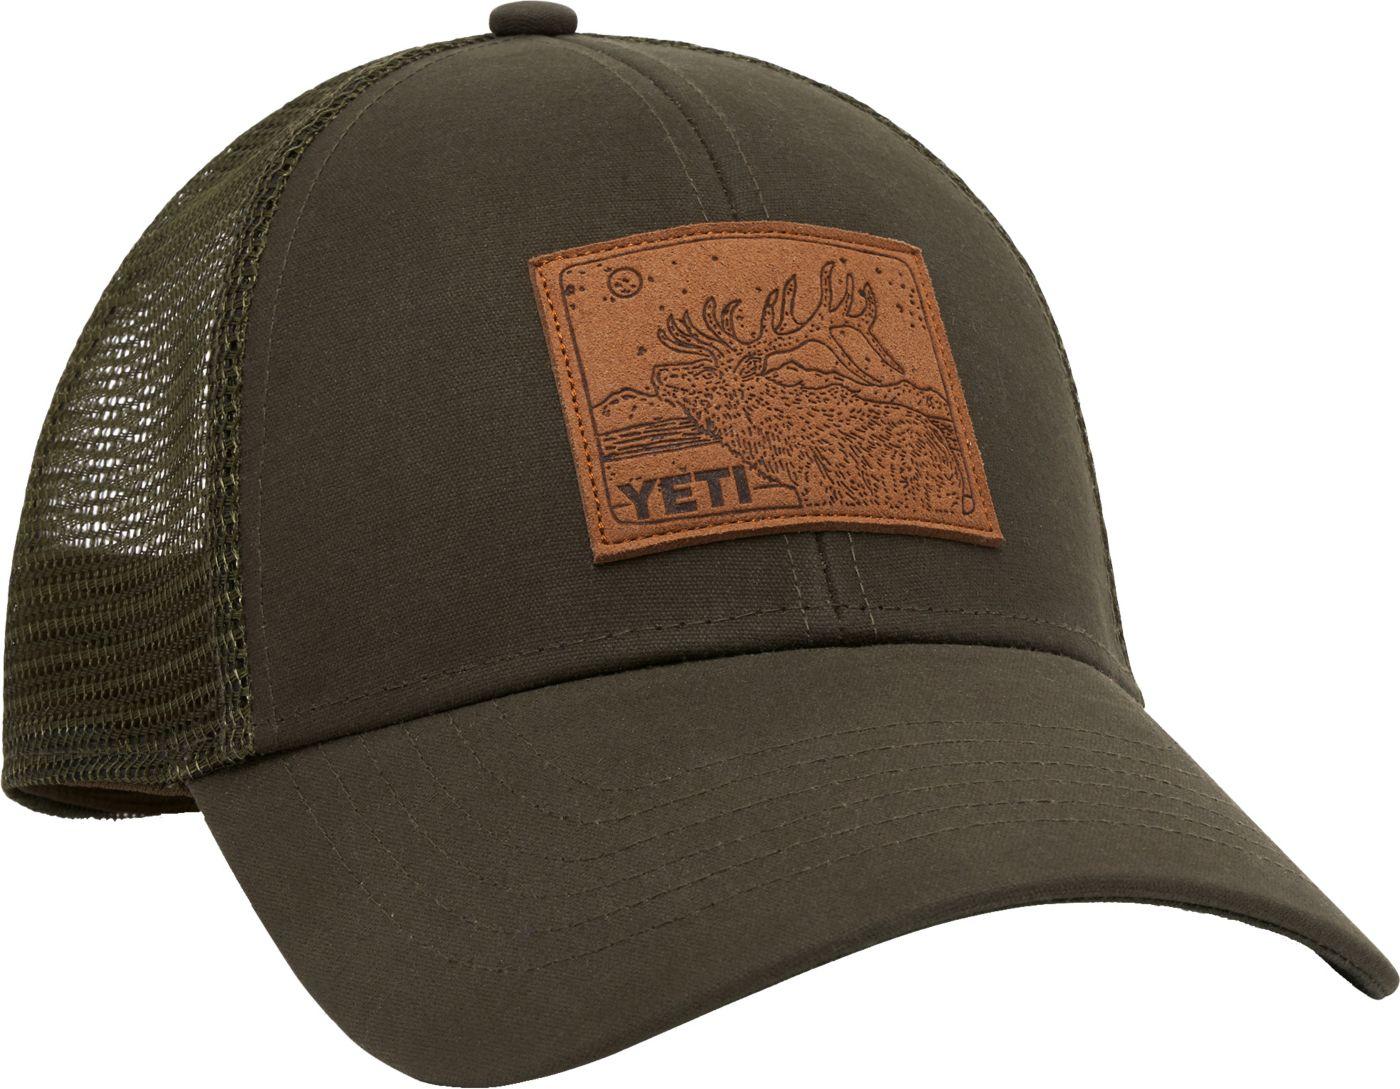 YETI Men's Leather Patch Trucker Hat